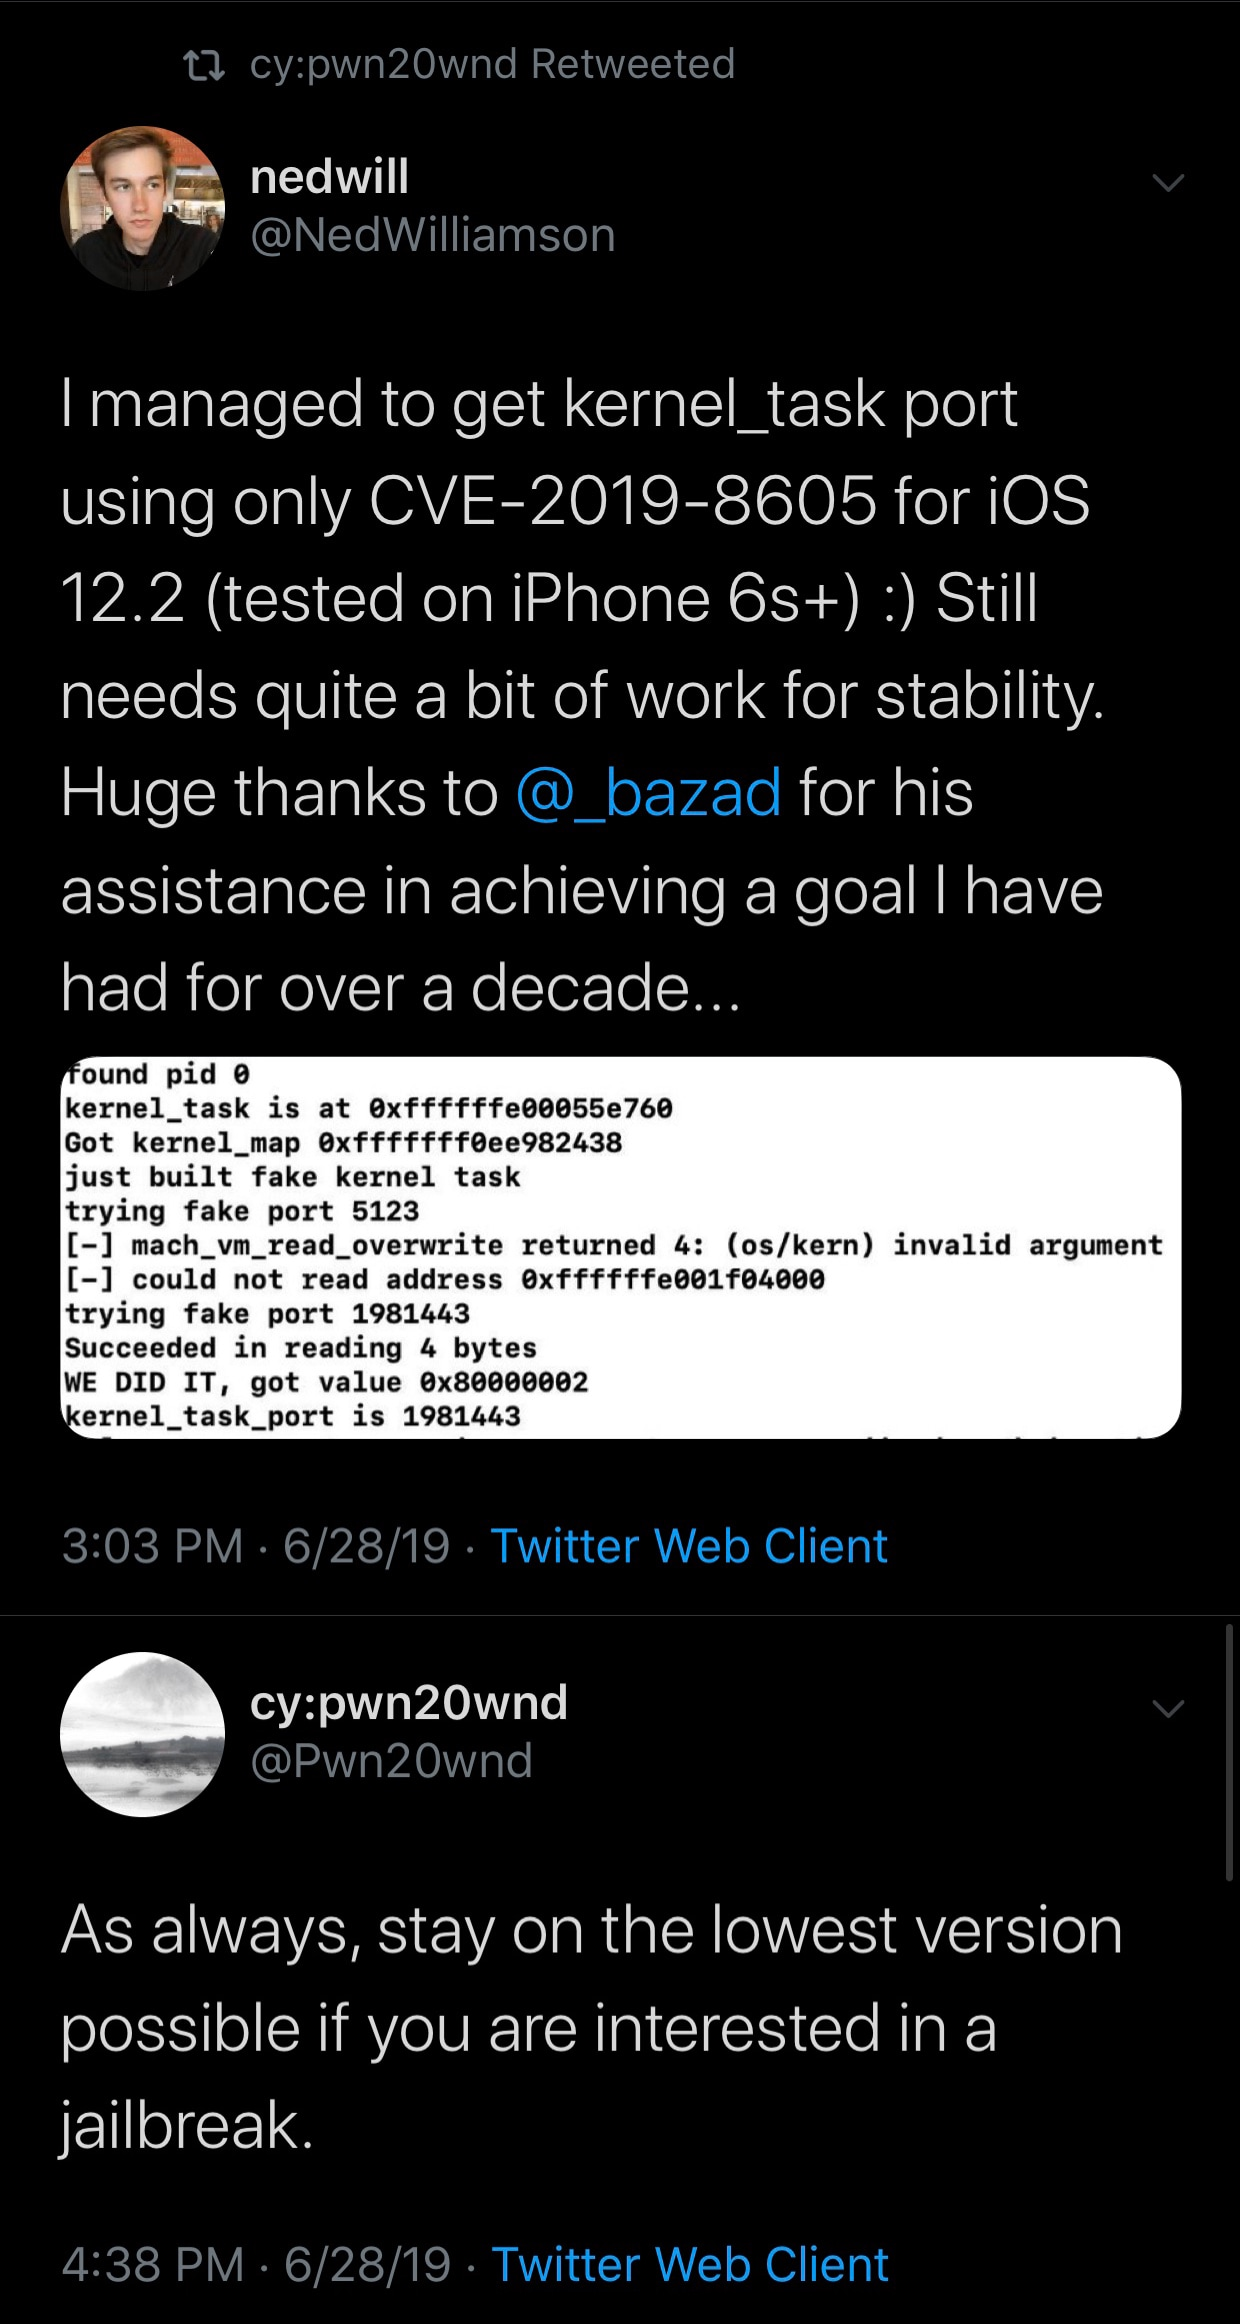 A Tfp0 Exploit has Been Achieved on iOS 12.2